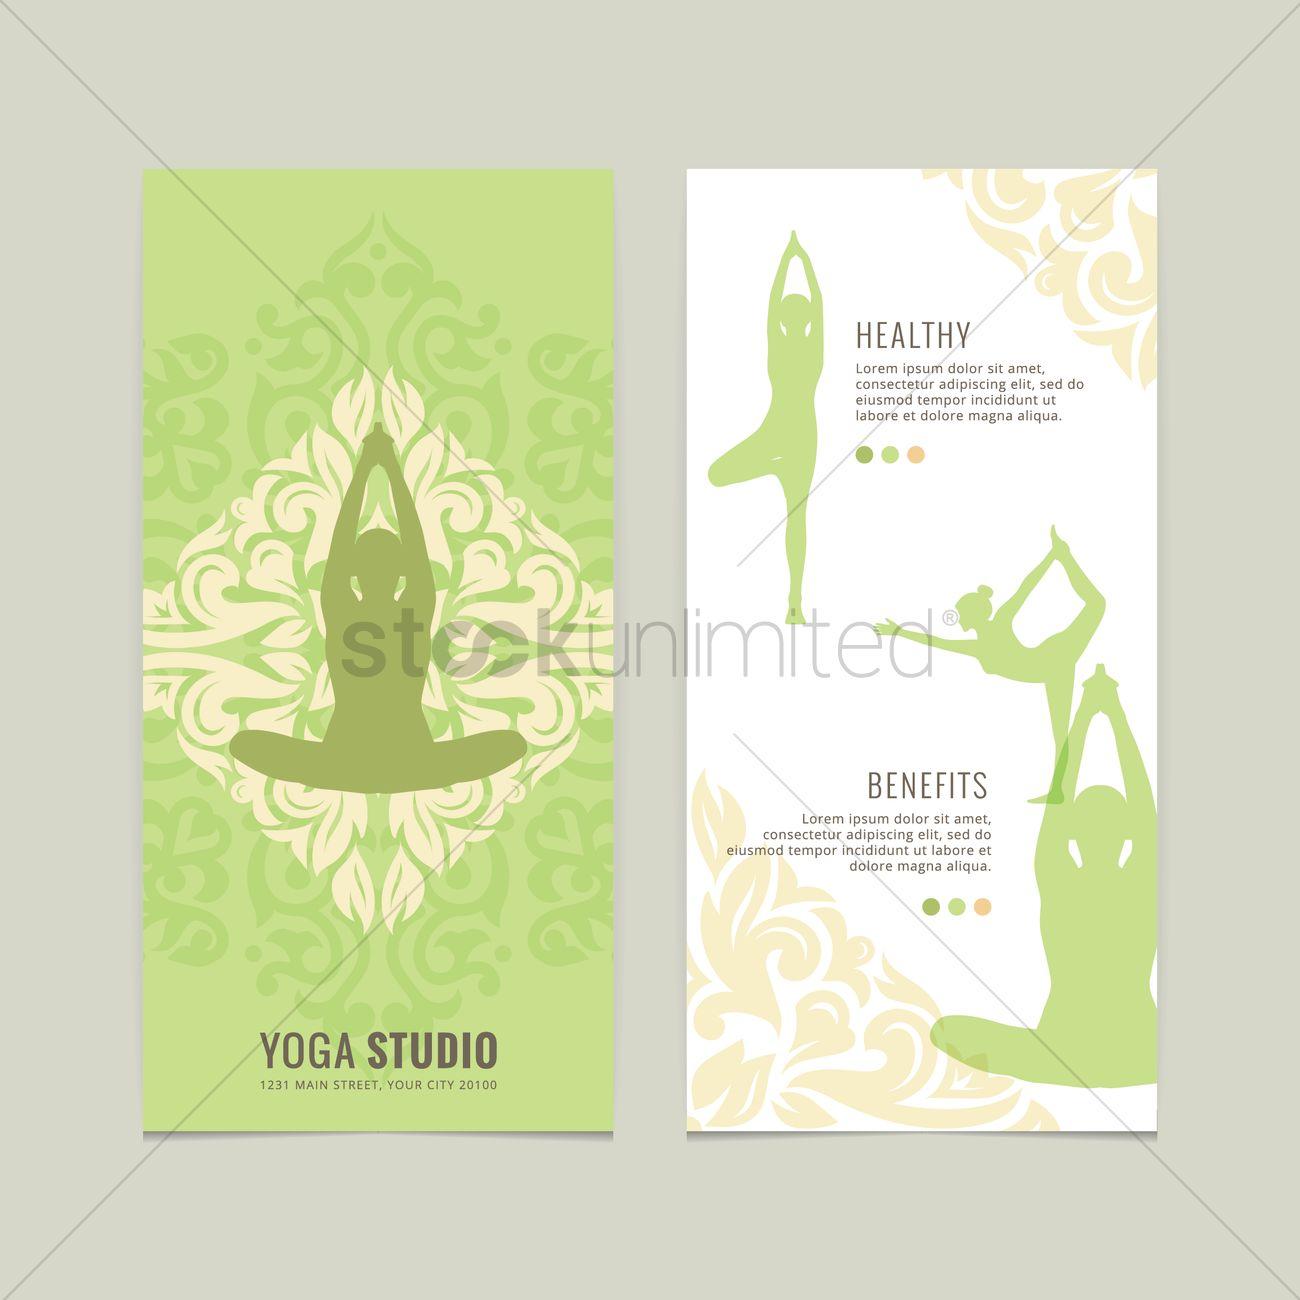 Yoga Studio Flyer Design Vector Graphic